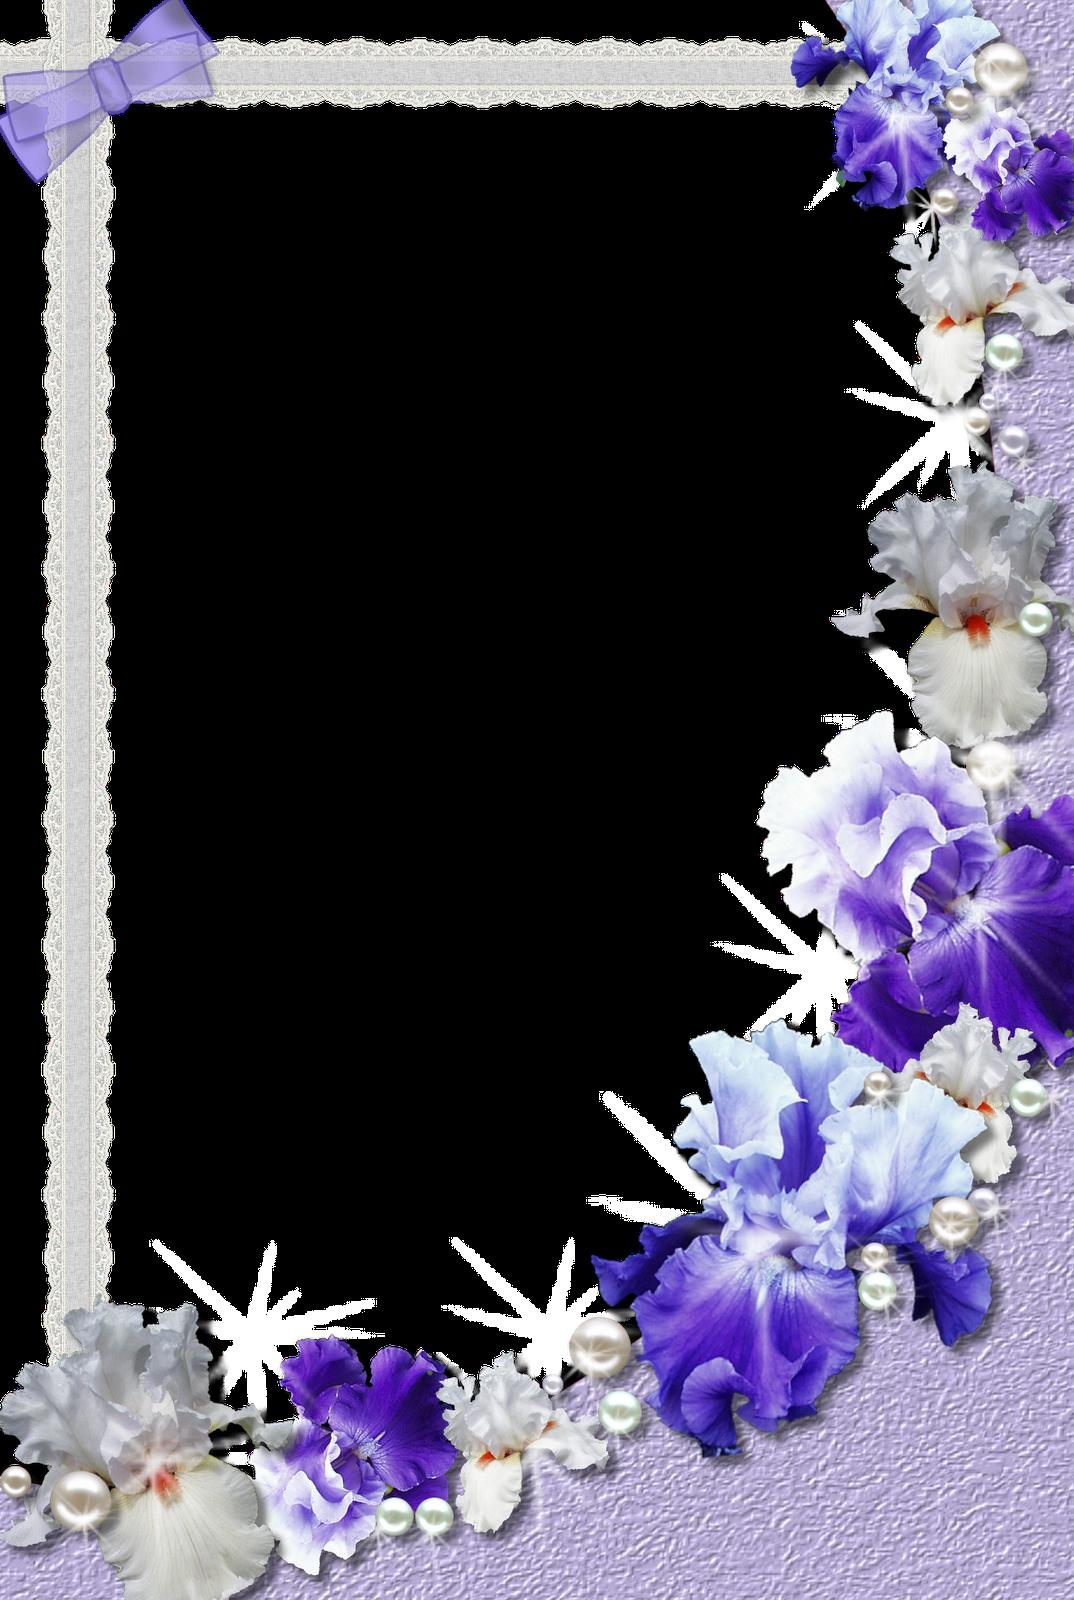 Free download Wallpaper Template Psd Jessica Alba Hd Iphone